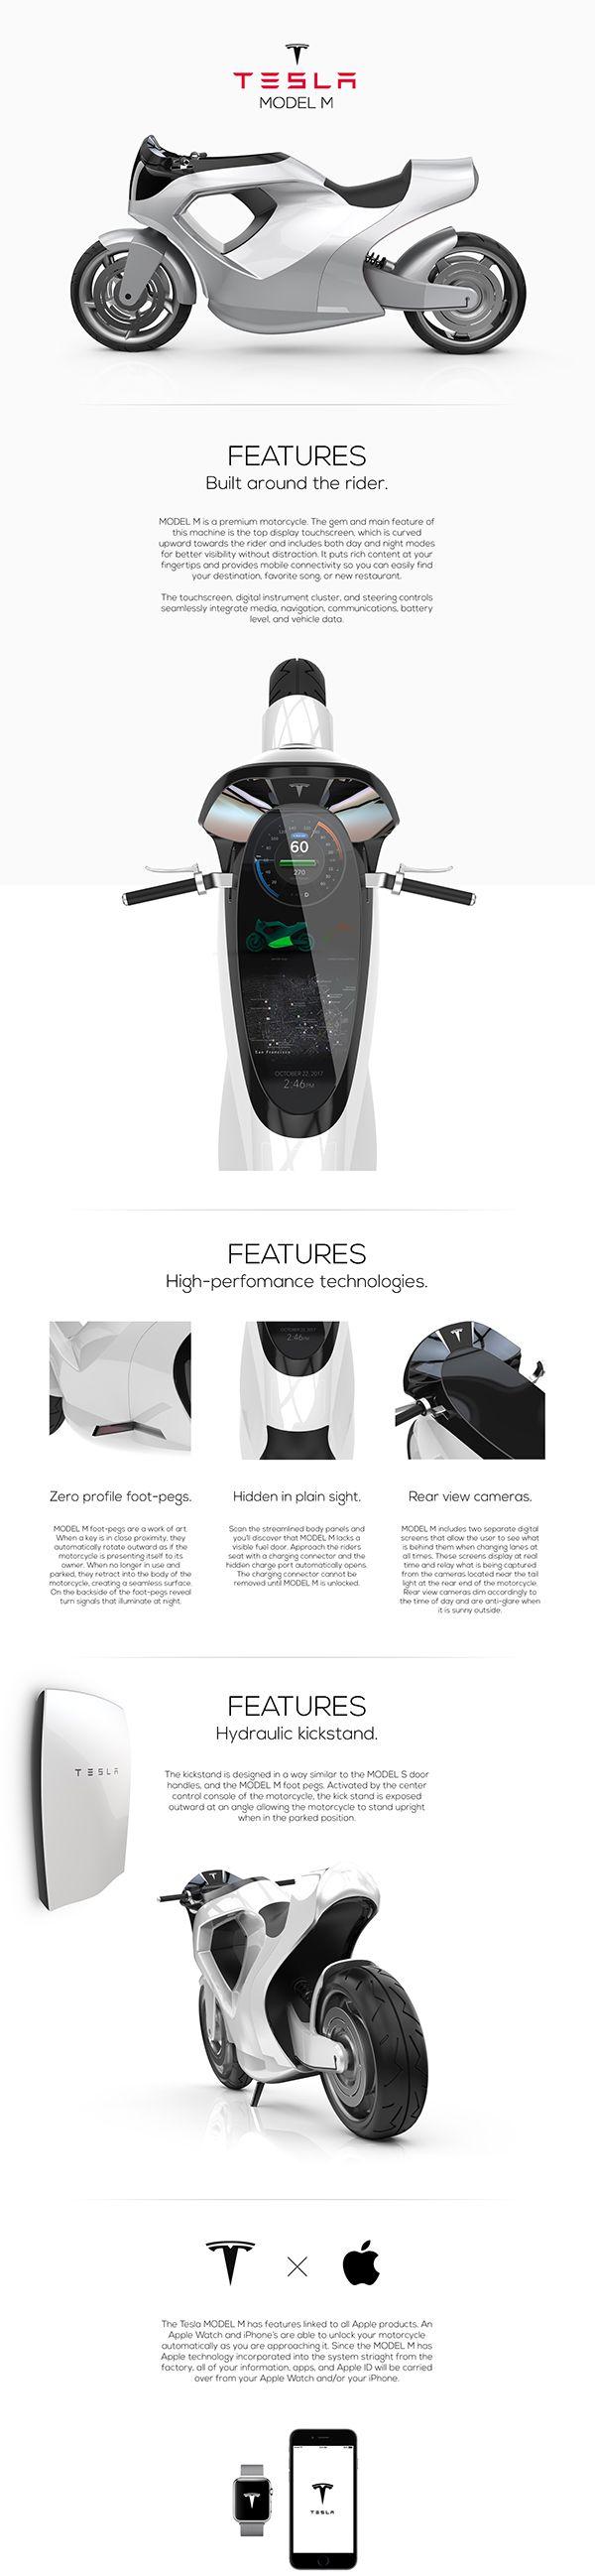 TESLA MODEL M on Behance Design,Tecnologia,Tesla,Veículos,Eletricos,Meio Ambiente,Motocicletas,Blog do Mesquita XXX